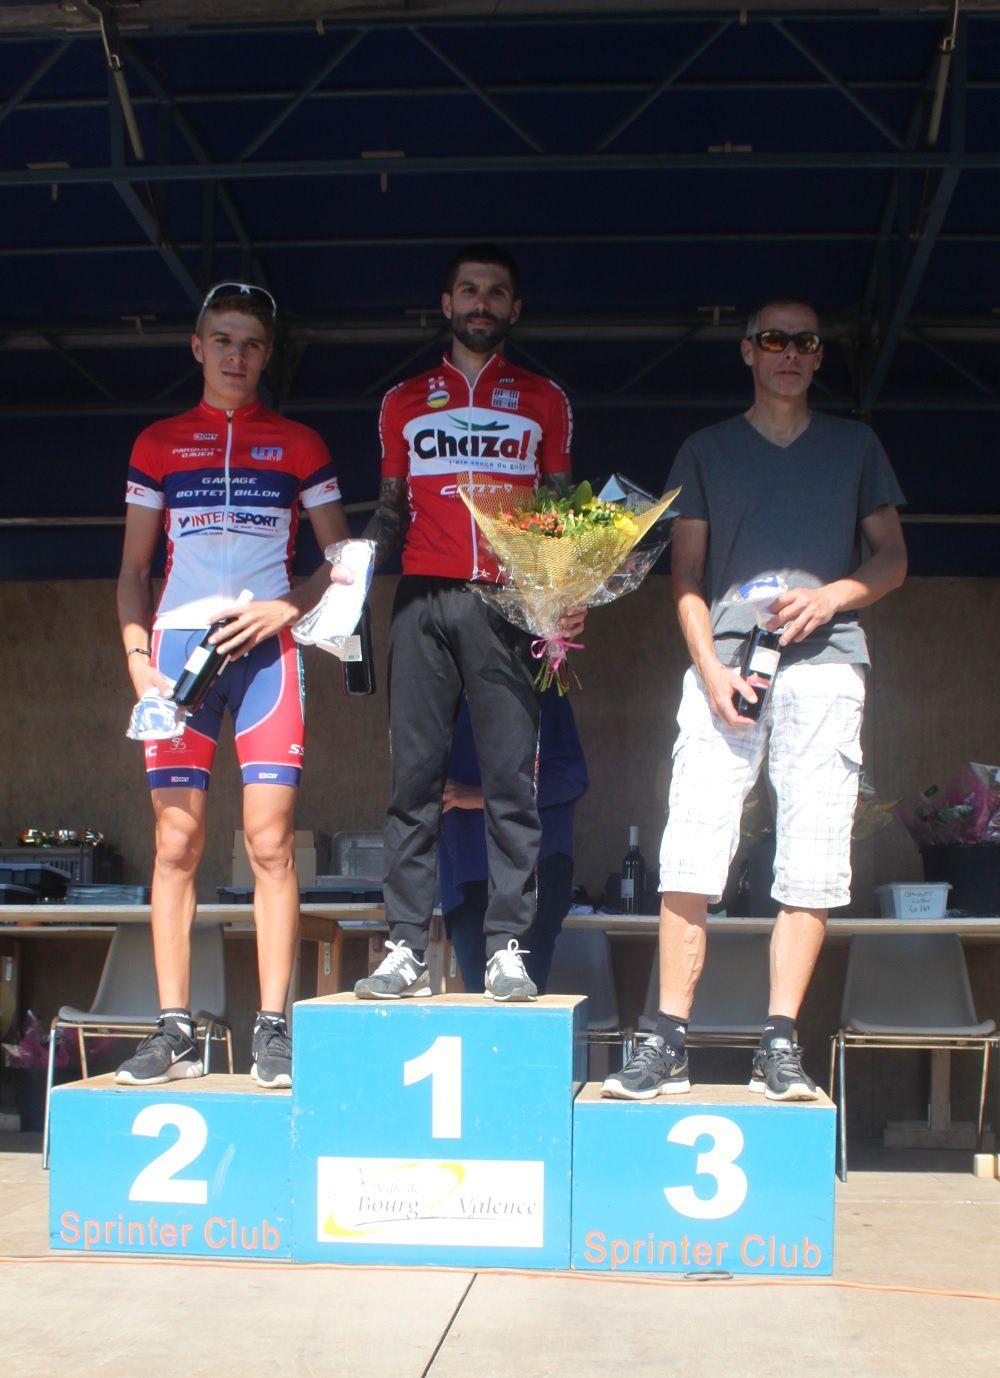 Le podium passcyclisme